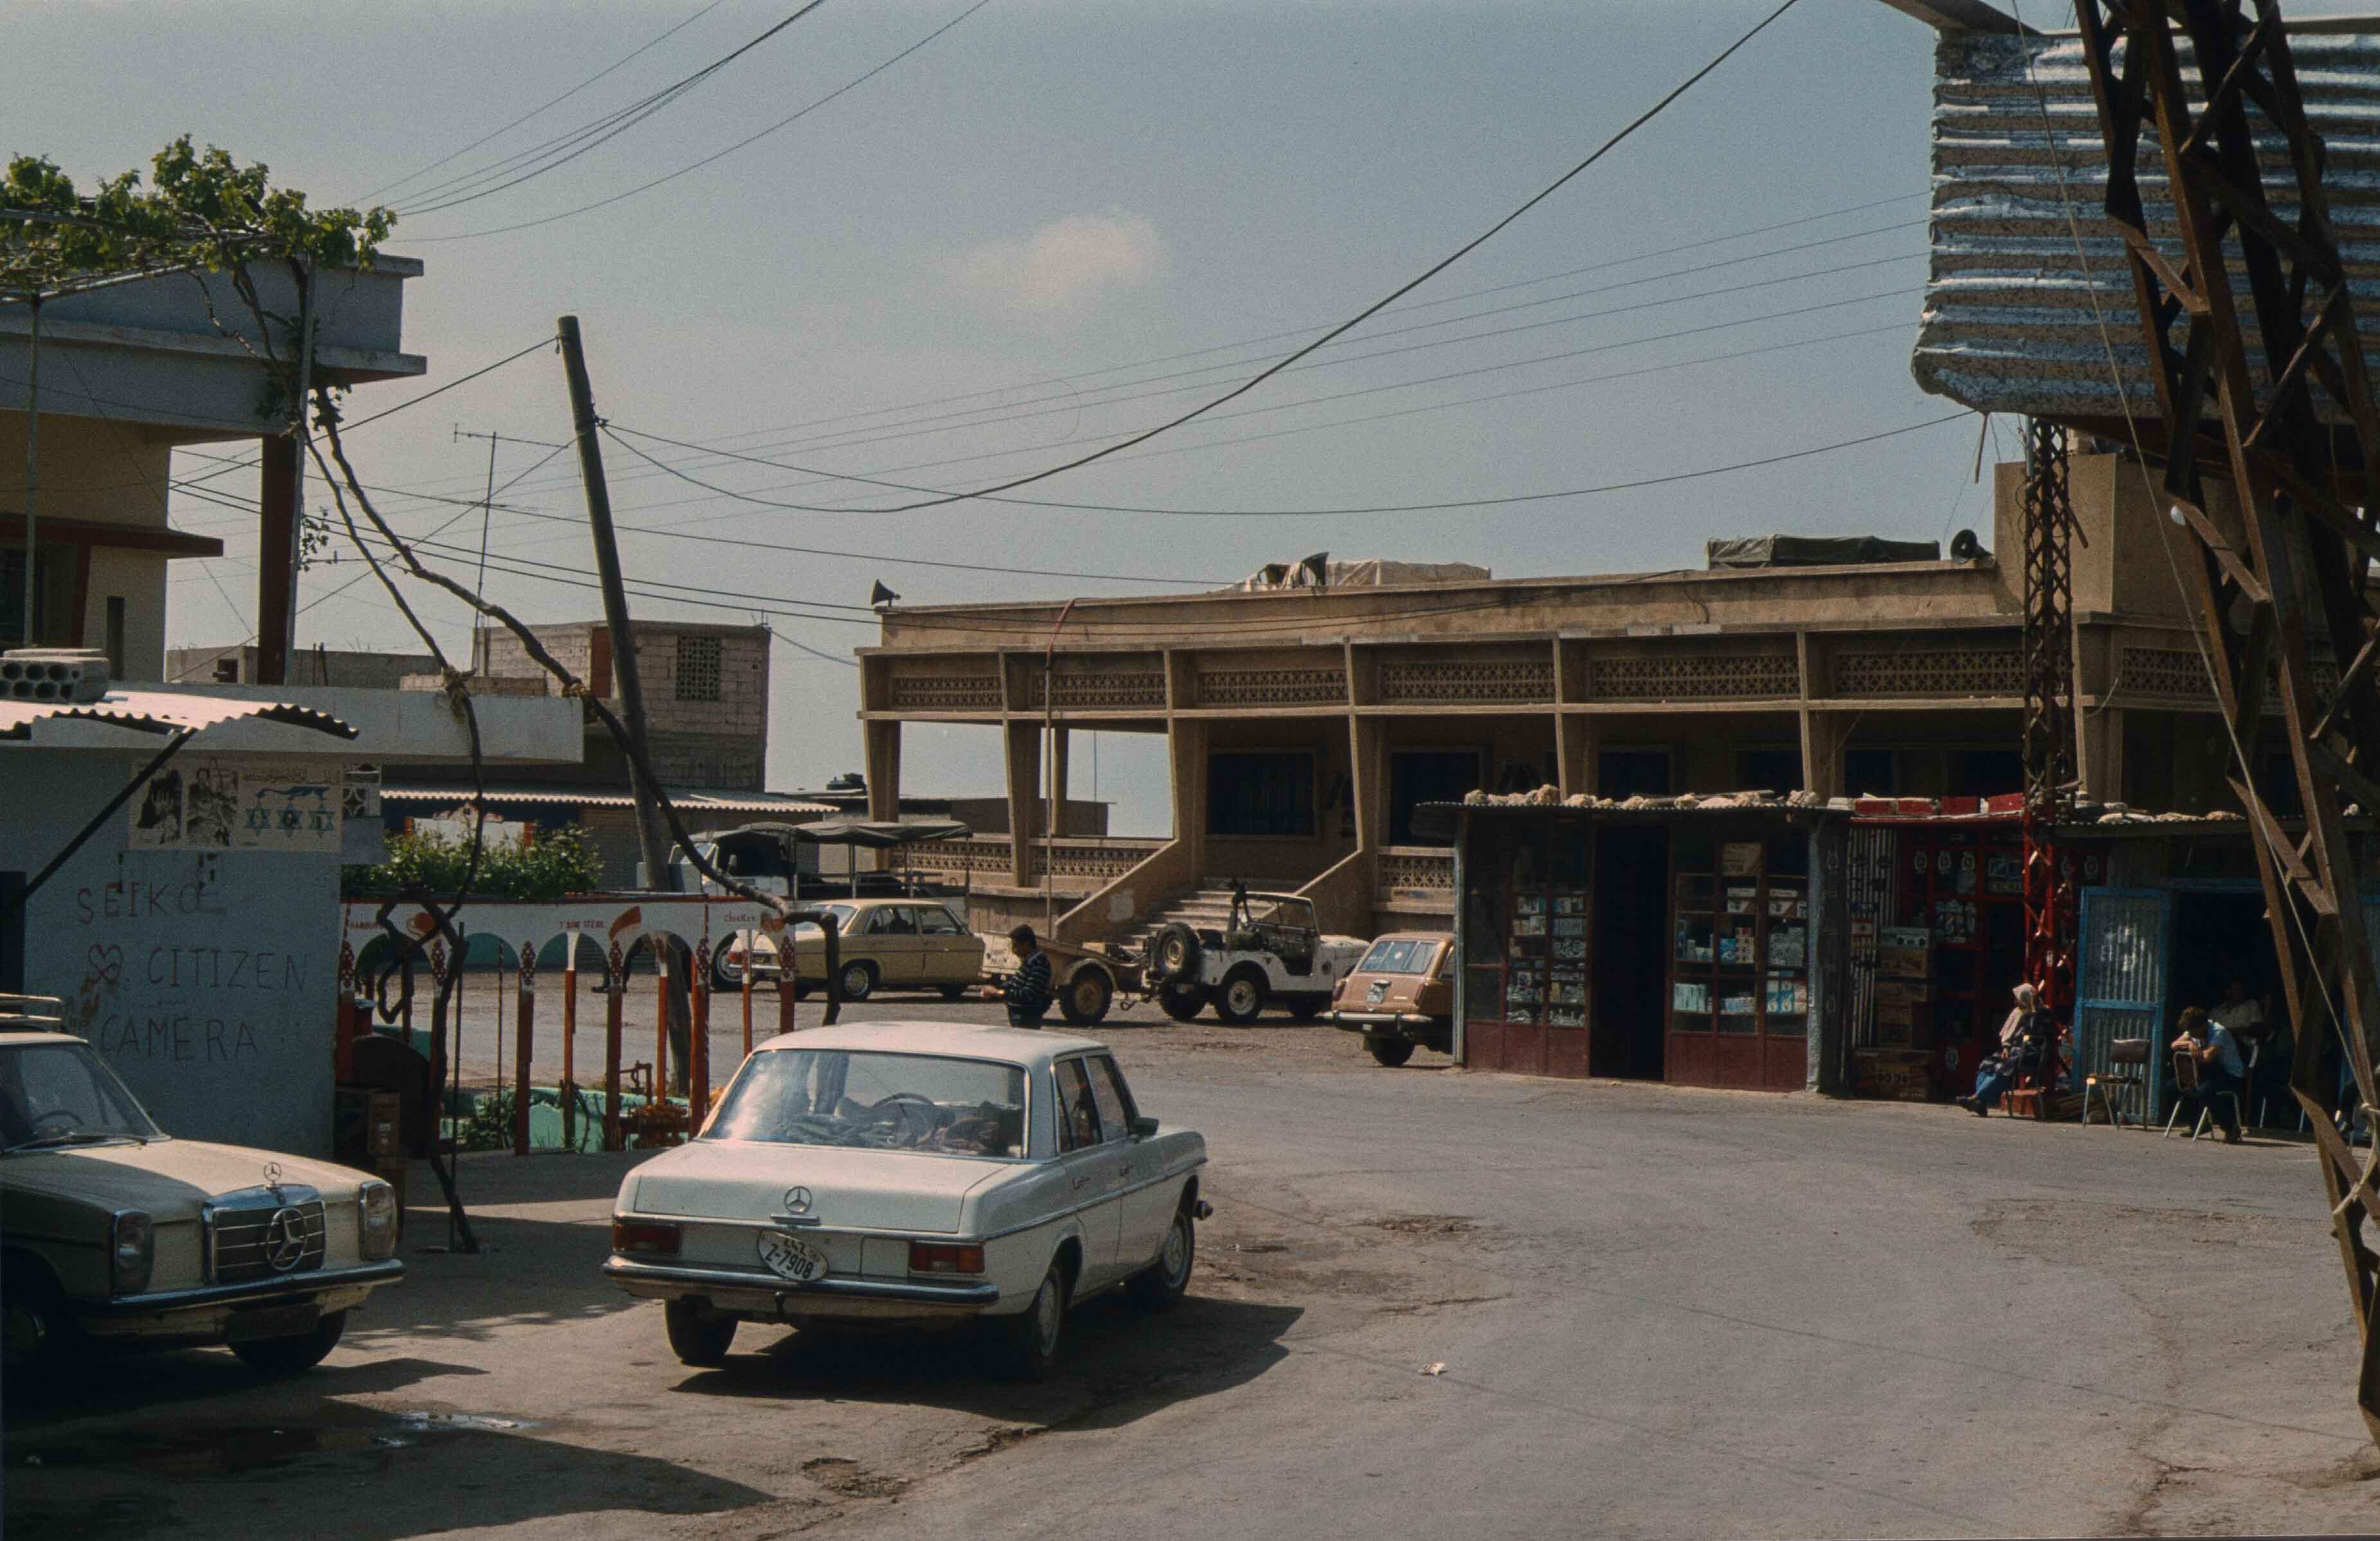 81. Libanon